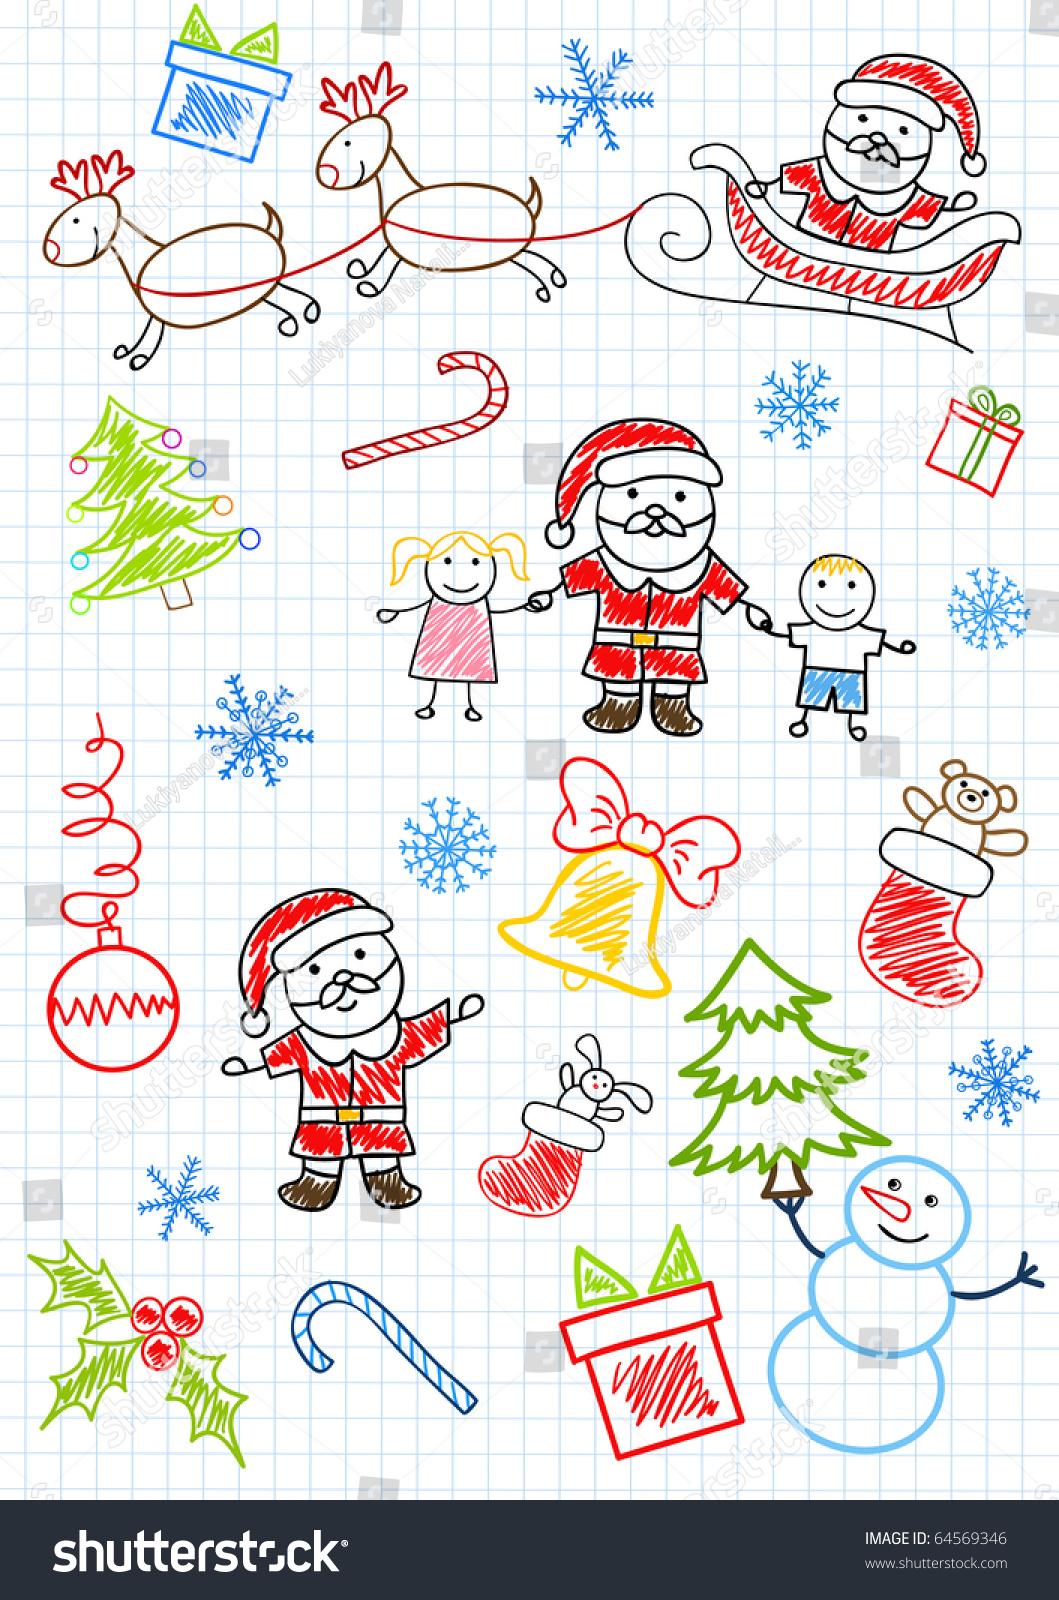 vector drawings santa claus children sketch stock vector 64569346